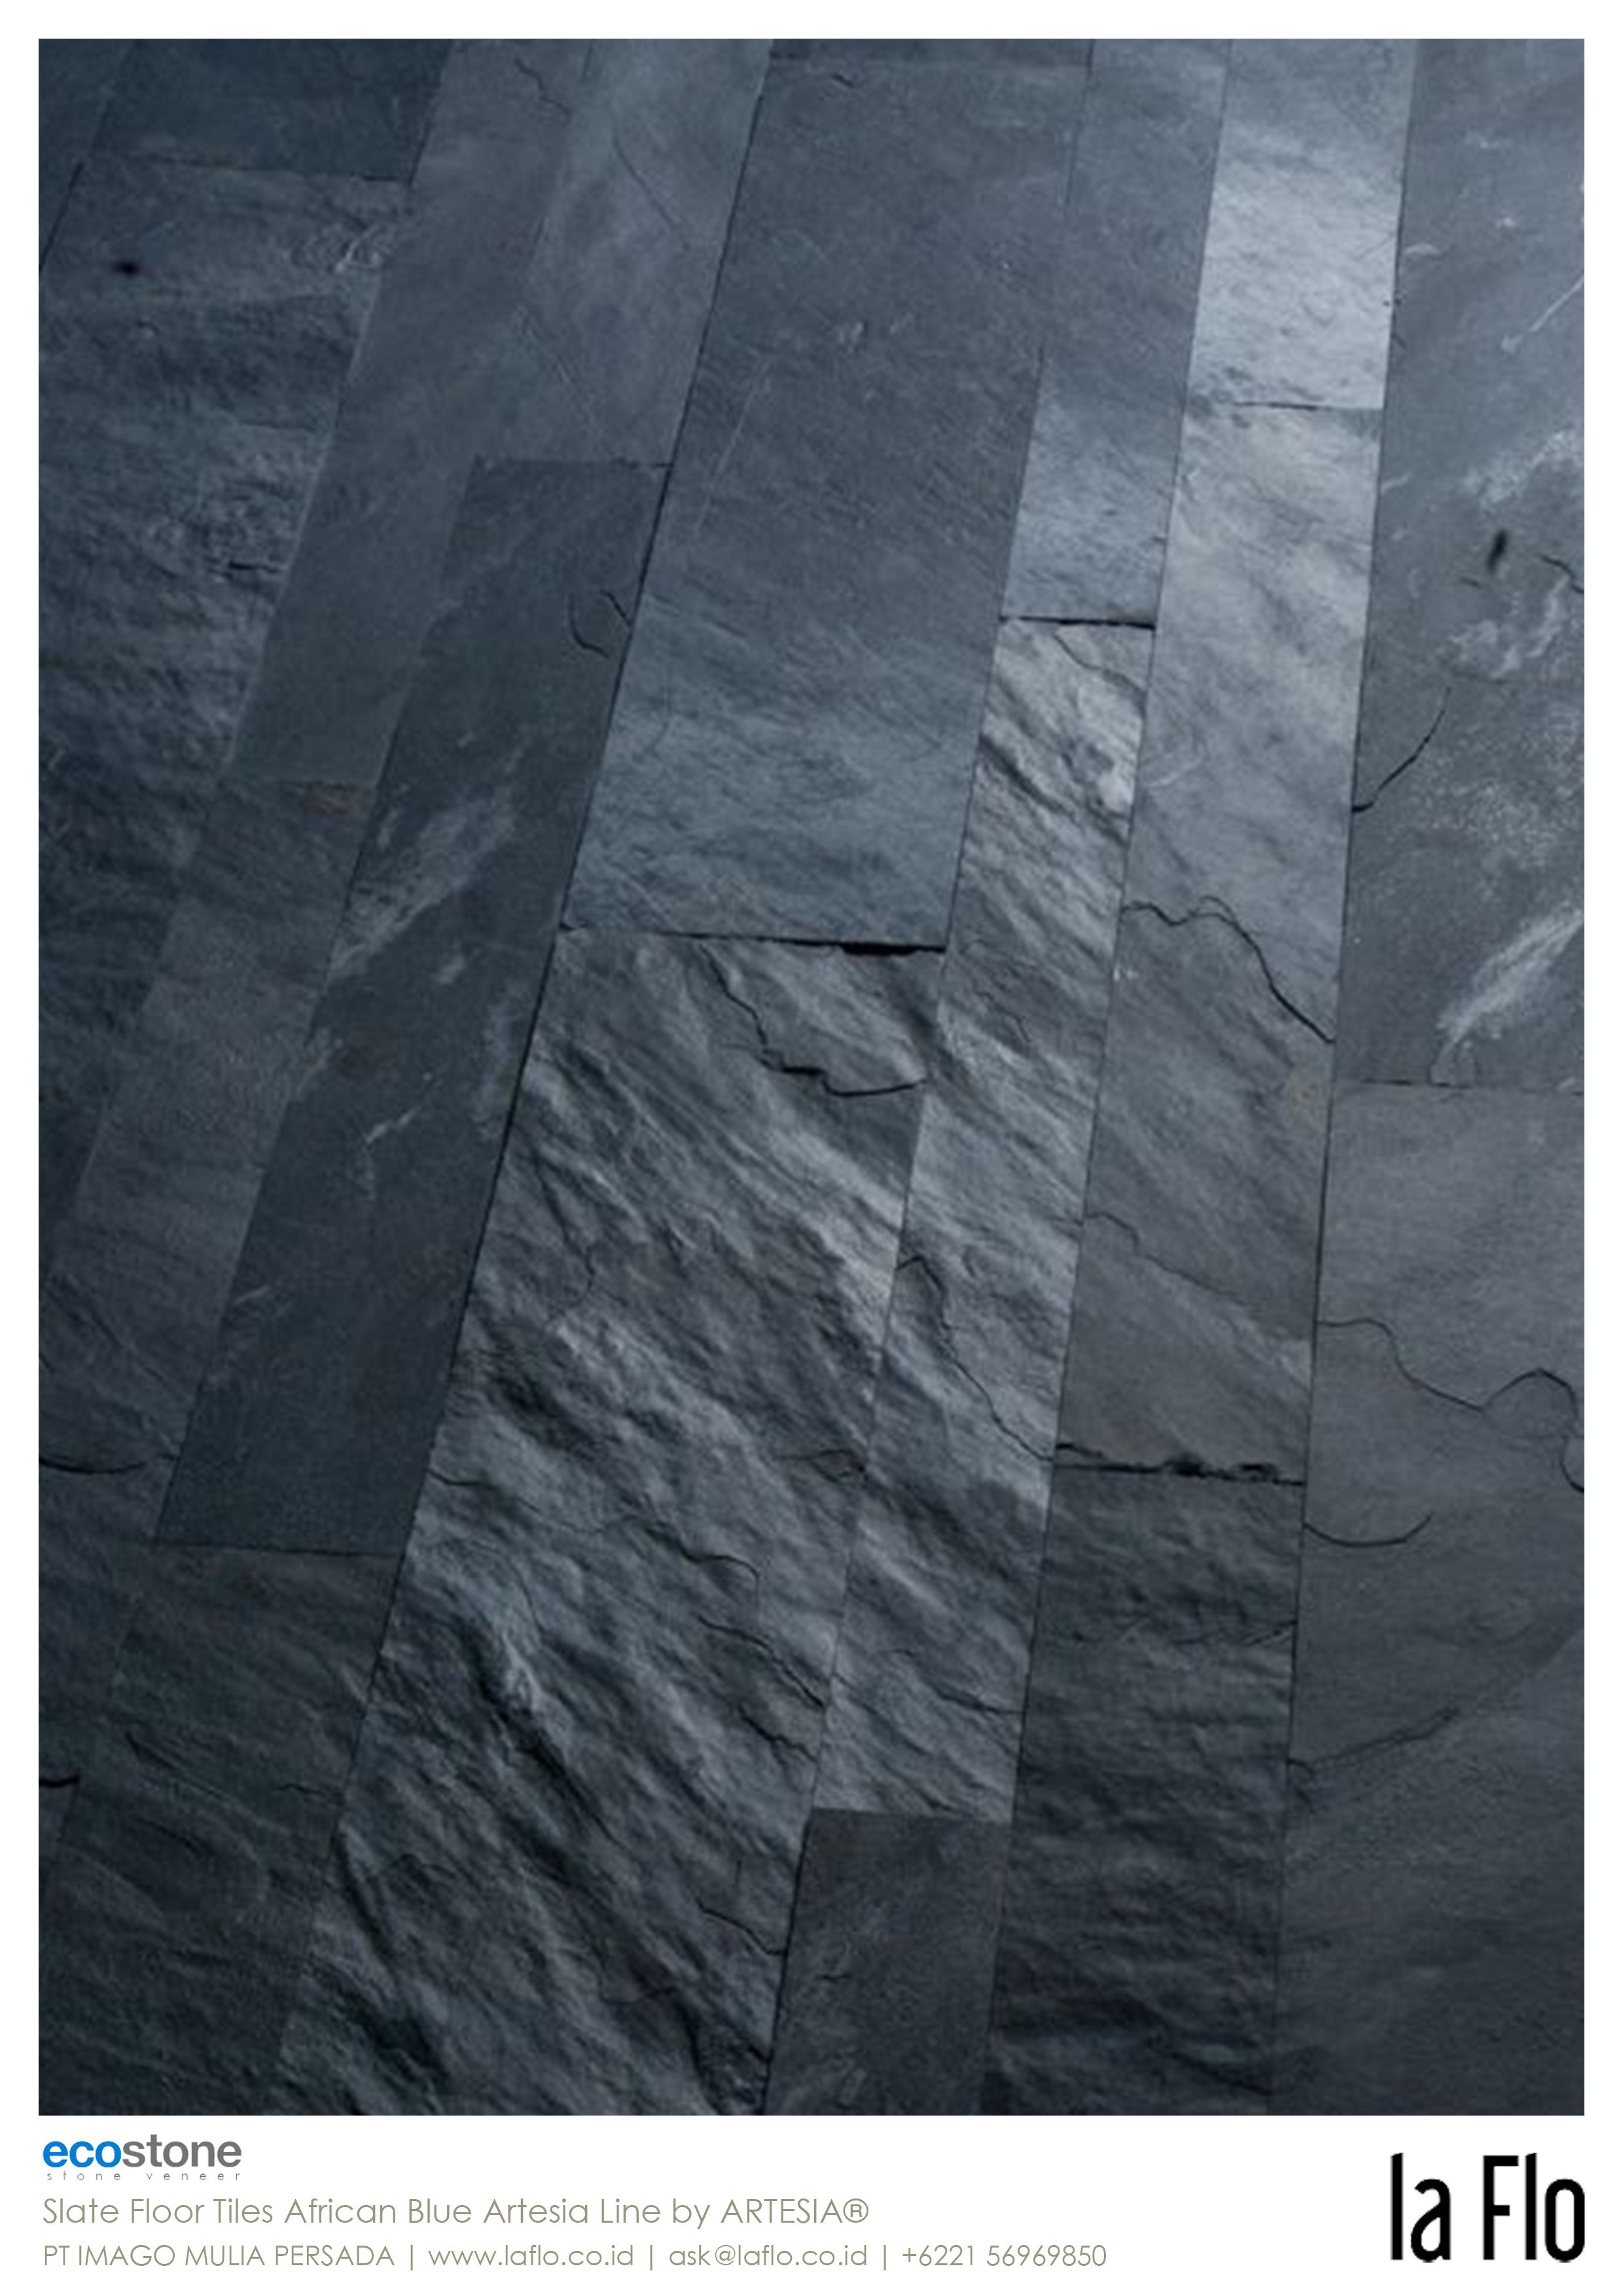 African tiles bathroom - Design Idea Floor Tiles Stoneveneer At Slate Floor Tiles African Blue Artesia Line